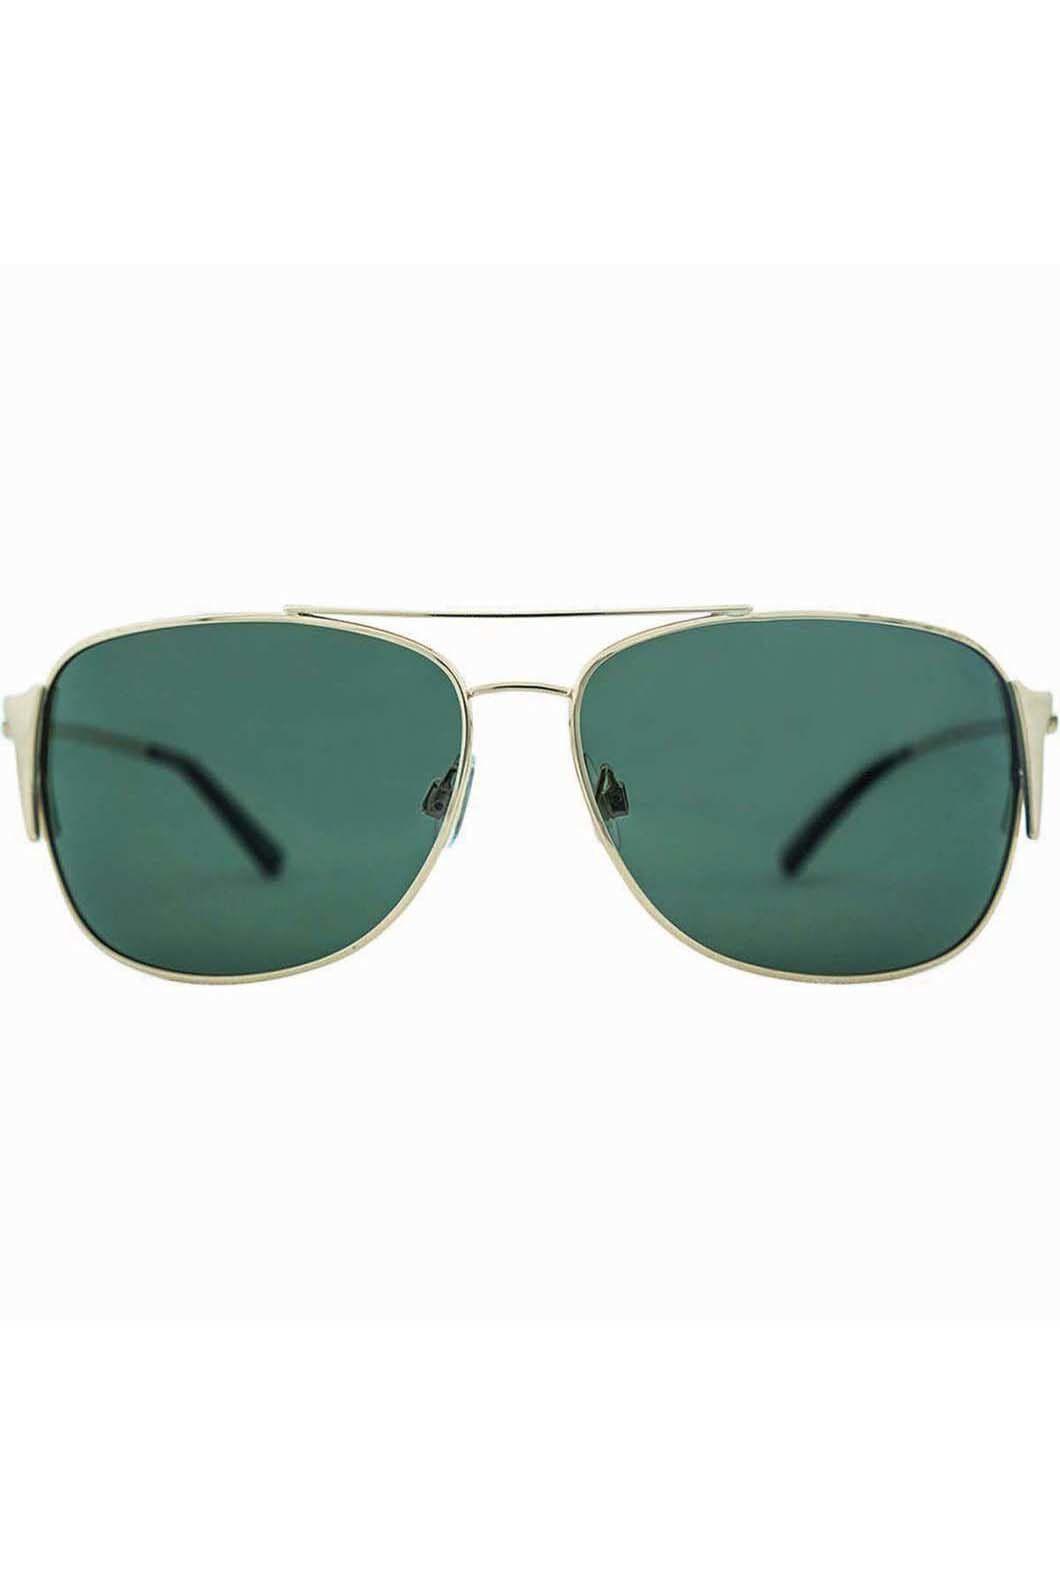 Venture Eyewear Men's Maverick Sunglasses, GOLD/G15, hi-res